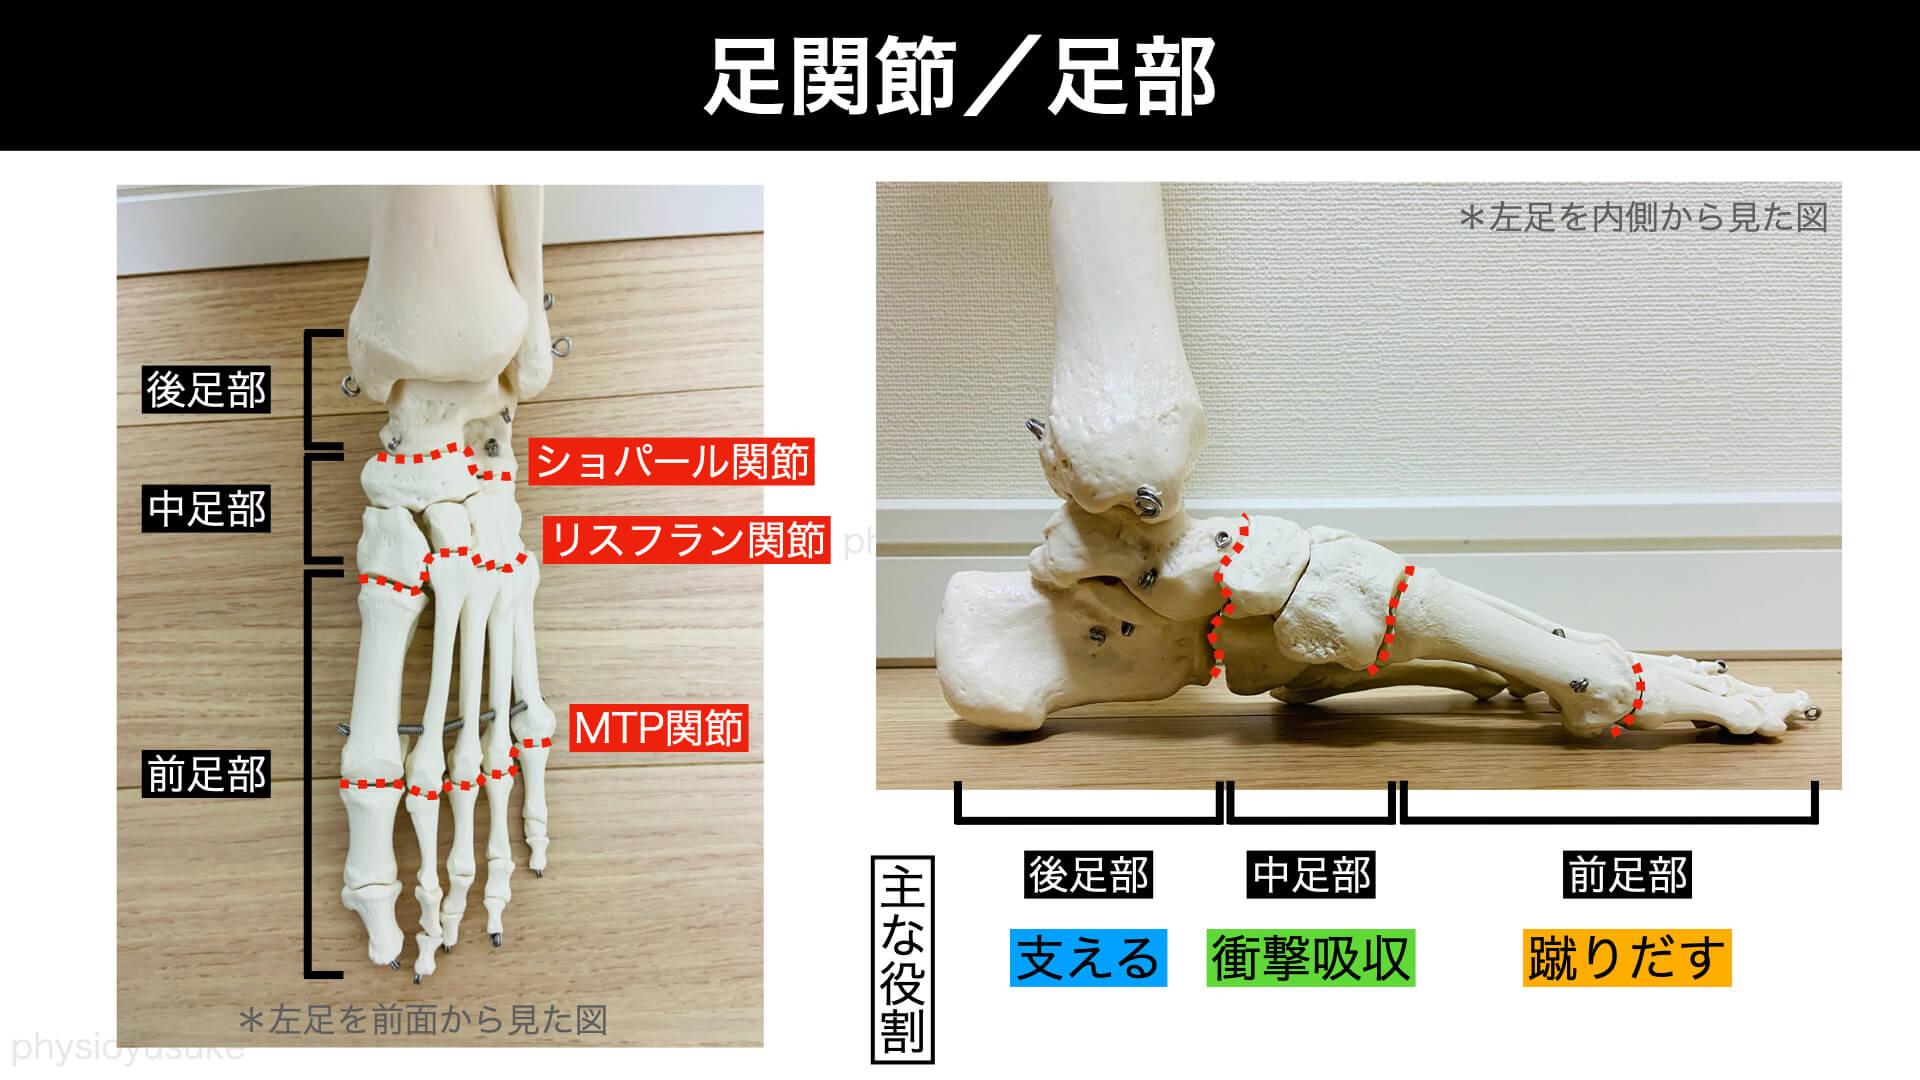 足部/足関節の解剖